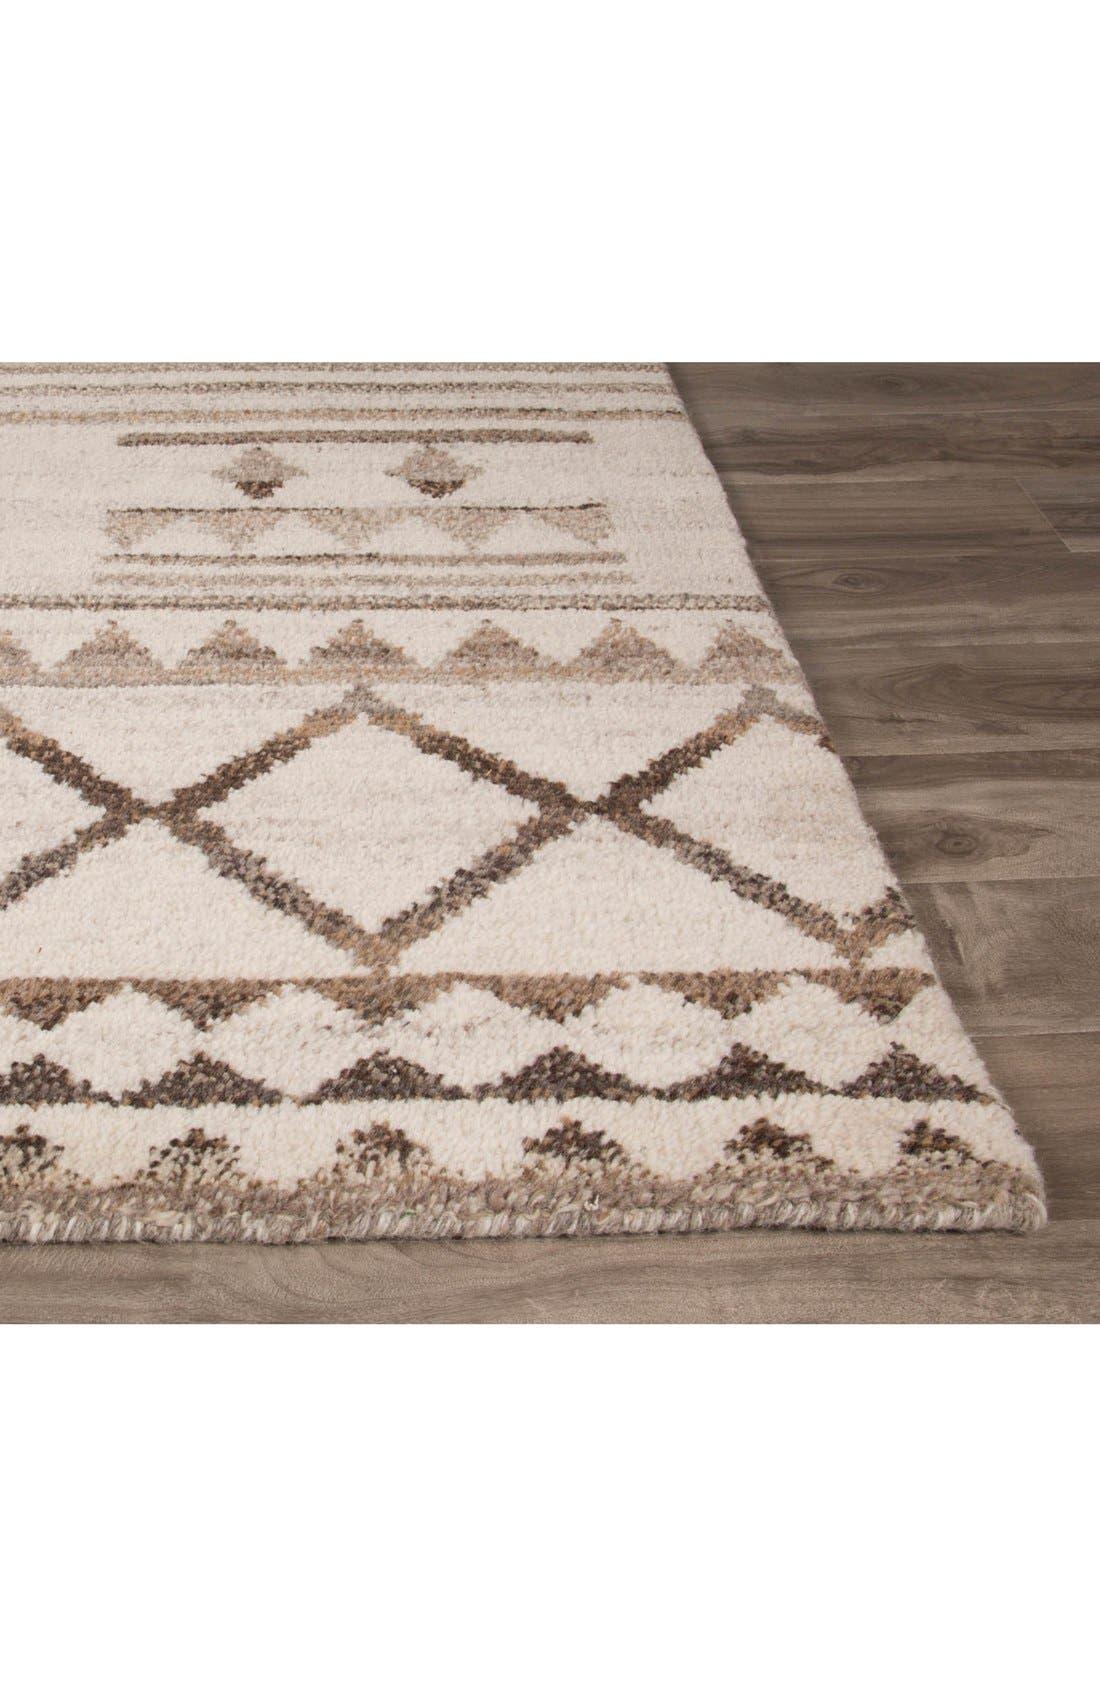 'Vanden Bohemian' Wool Rug,                             Alternate thumbnail 2, color,                             210